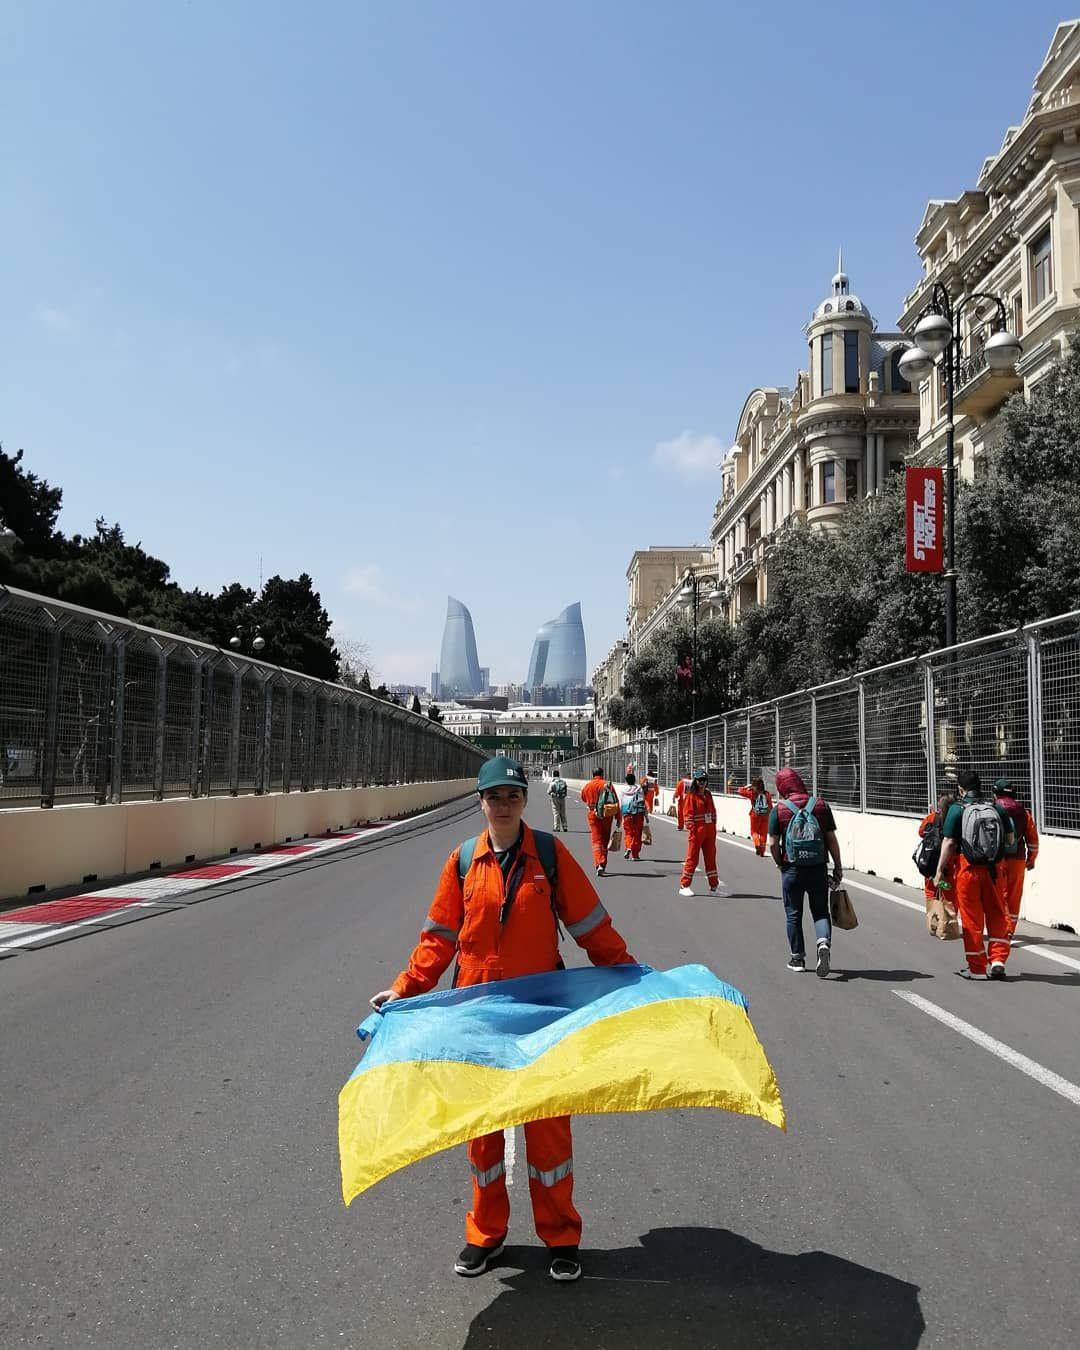 F1 Formula1 Grand Prix Azerbaijan Baku Grand Prix Azerbaijan Grand Prix Azerbaijan Travel Grand Prix